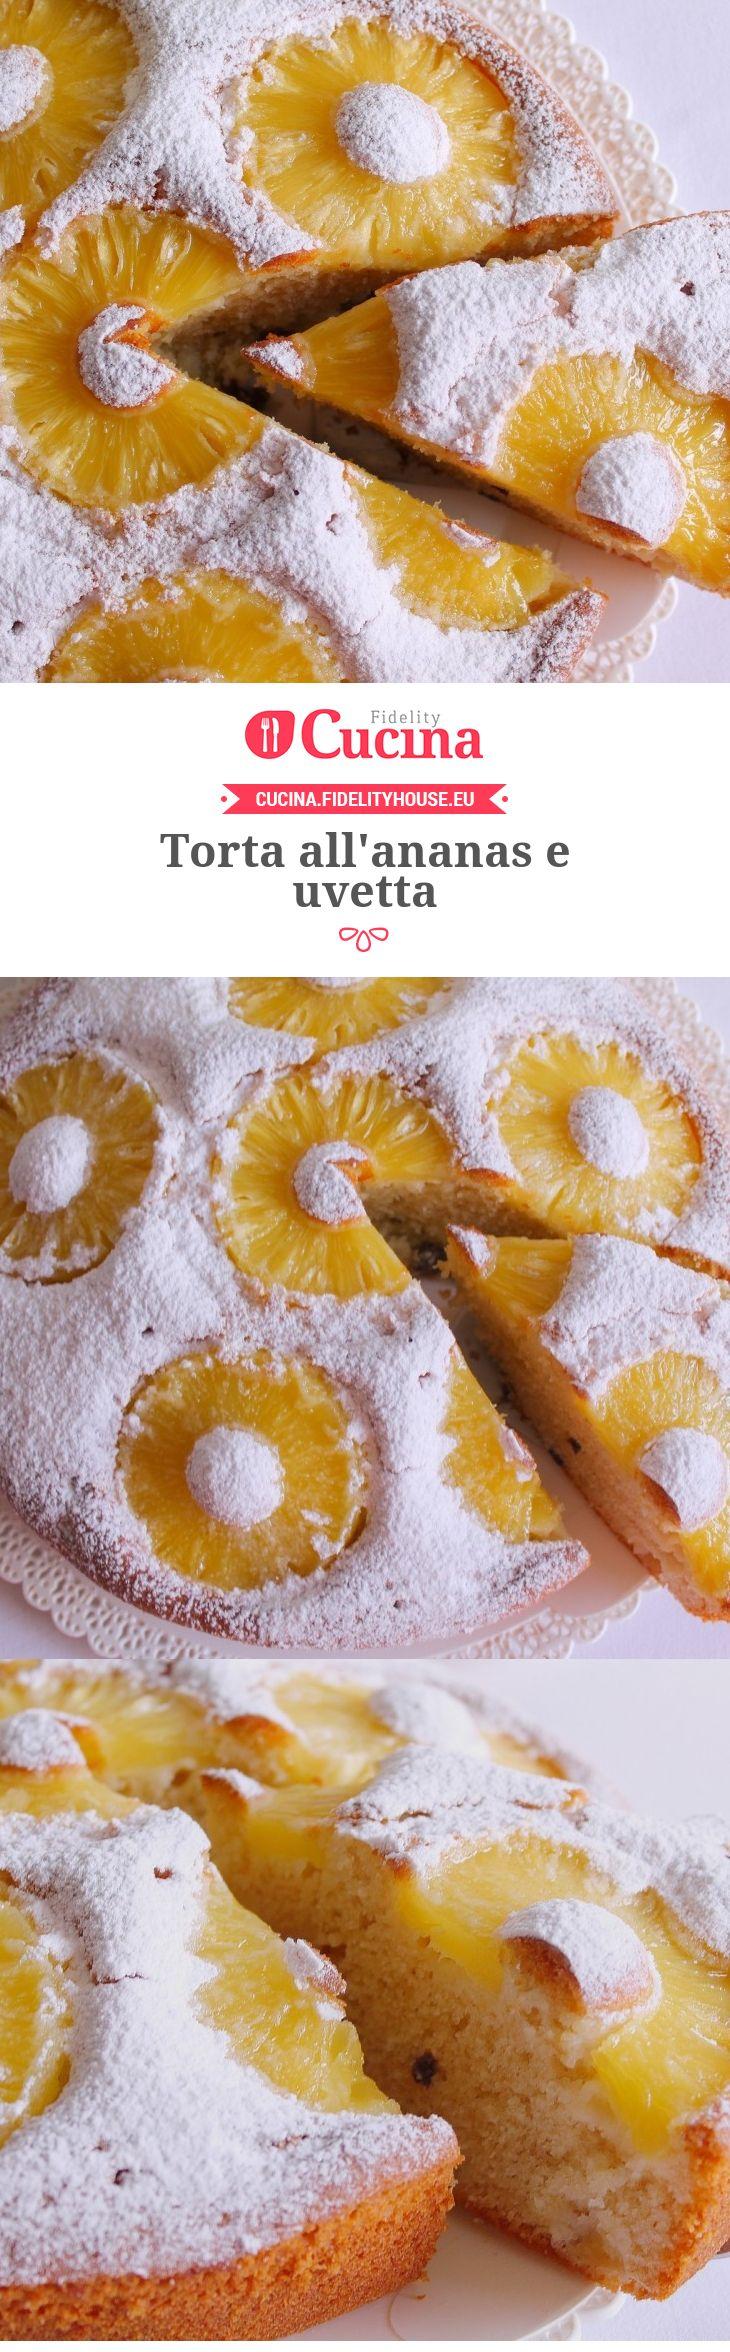 Photo of Torta all'ananas e uvetta